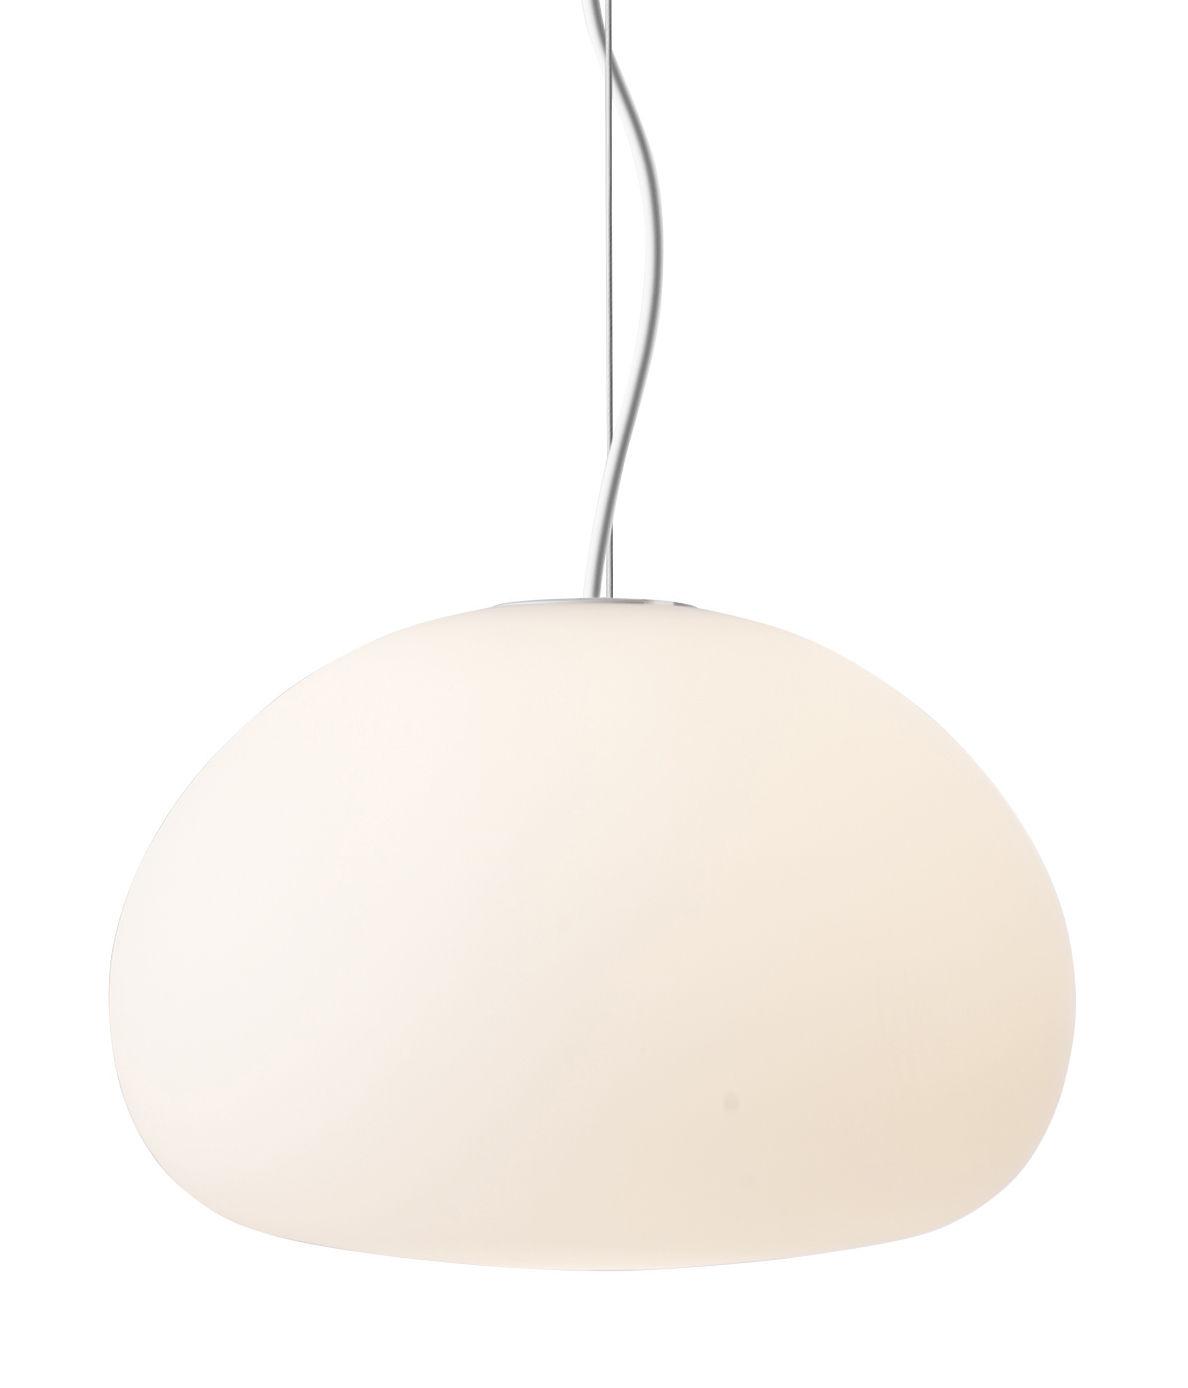 Luminaire - Suspensions - Suspension Fluid Small / ø 23 cm - Muuto - ø 23 cm / Blanc - Verre opalin